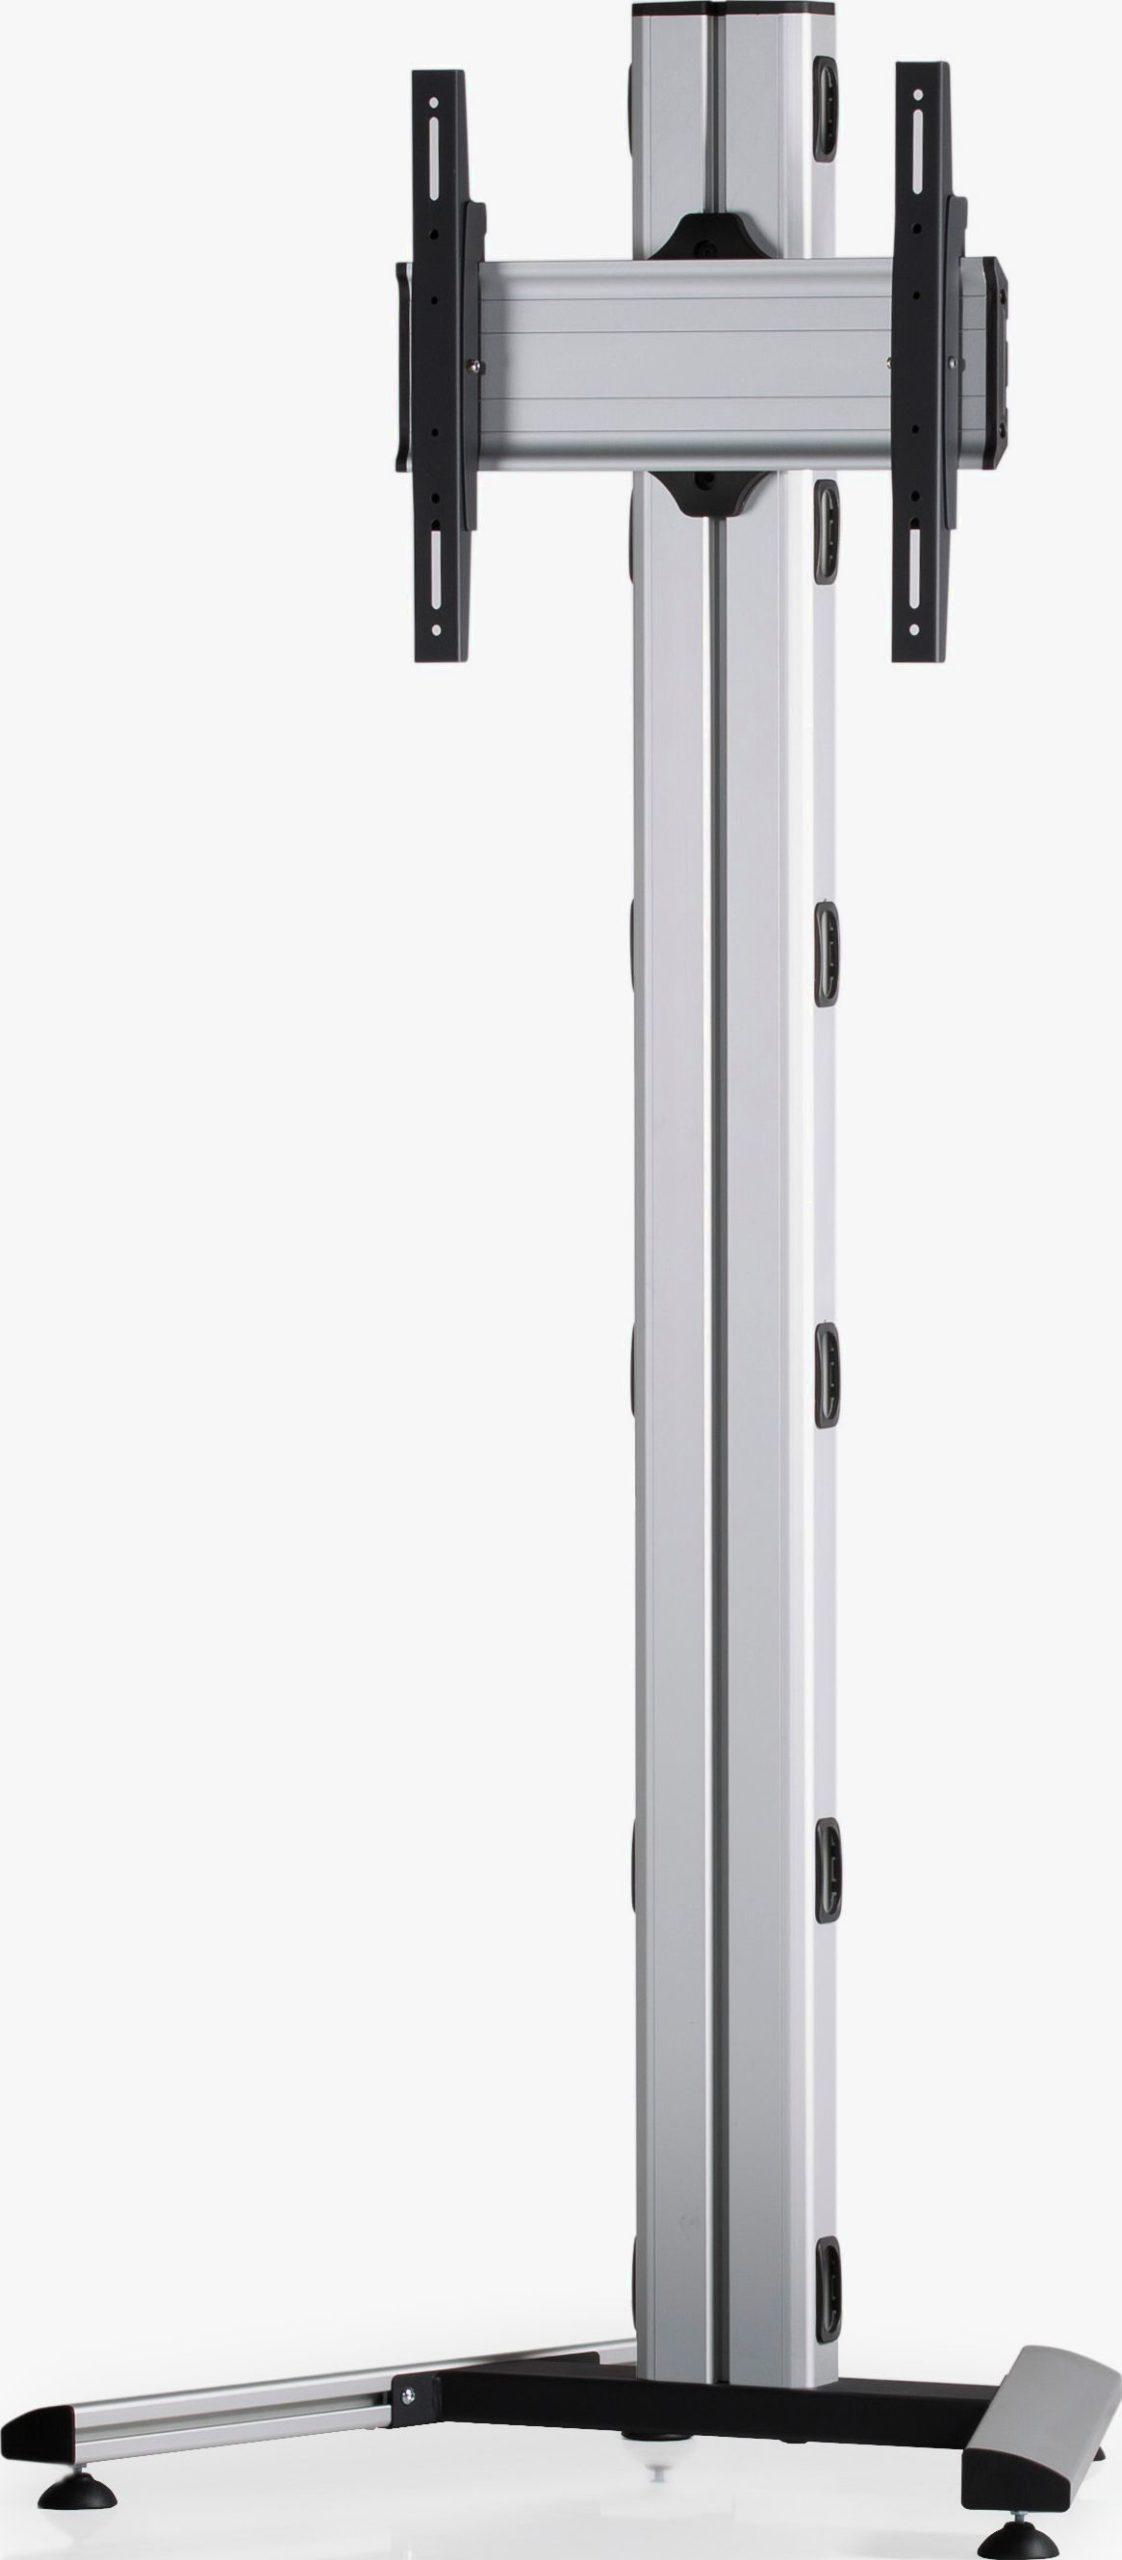 1 Display 1×1, Höhe 180 cm, Standard-VESA, auf Standfuß